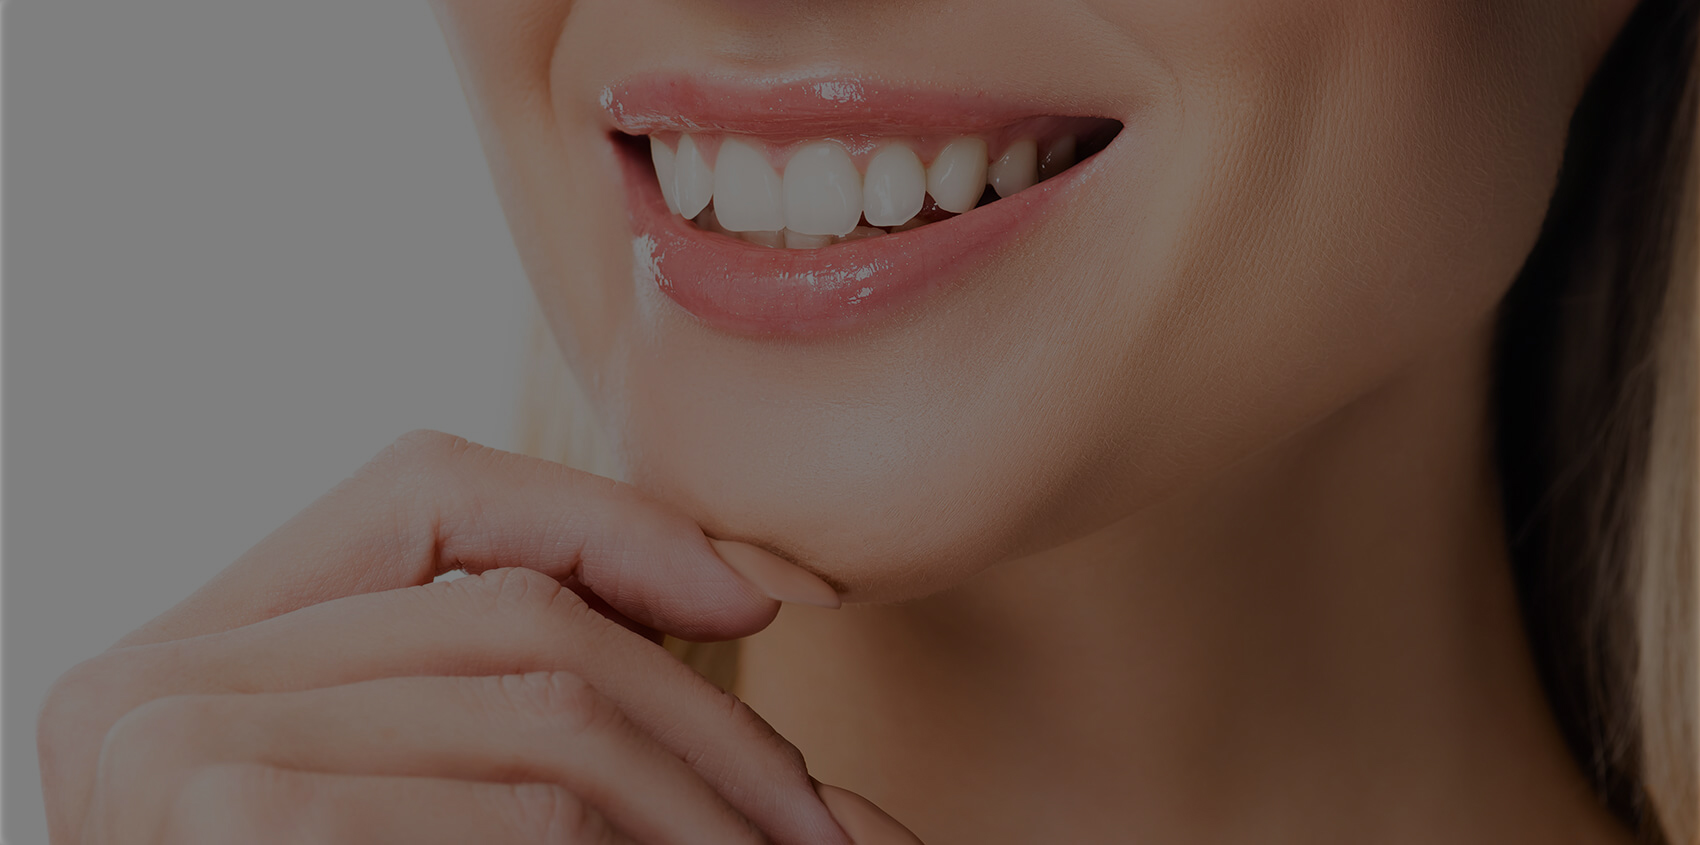 Rejuvenate Your Smile with Natural Looking Veneers